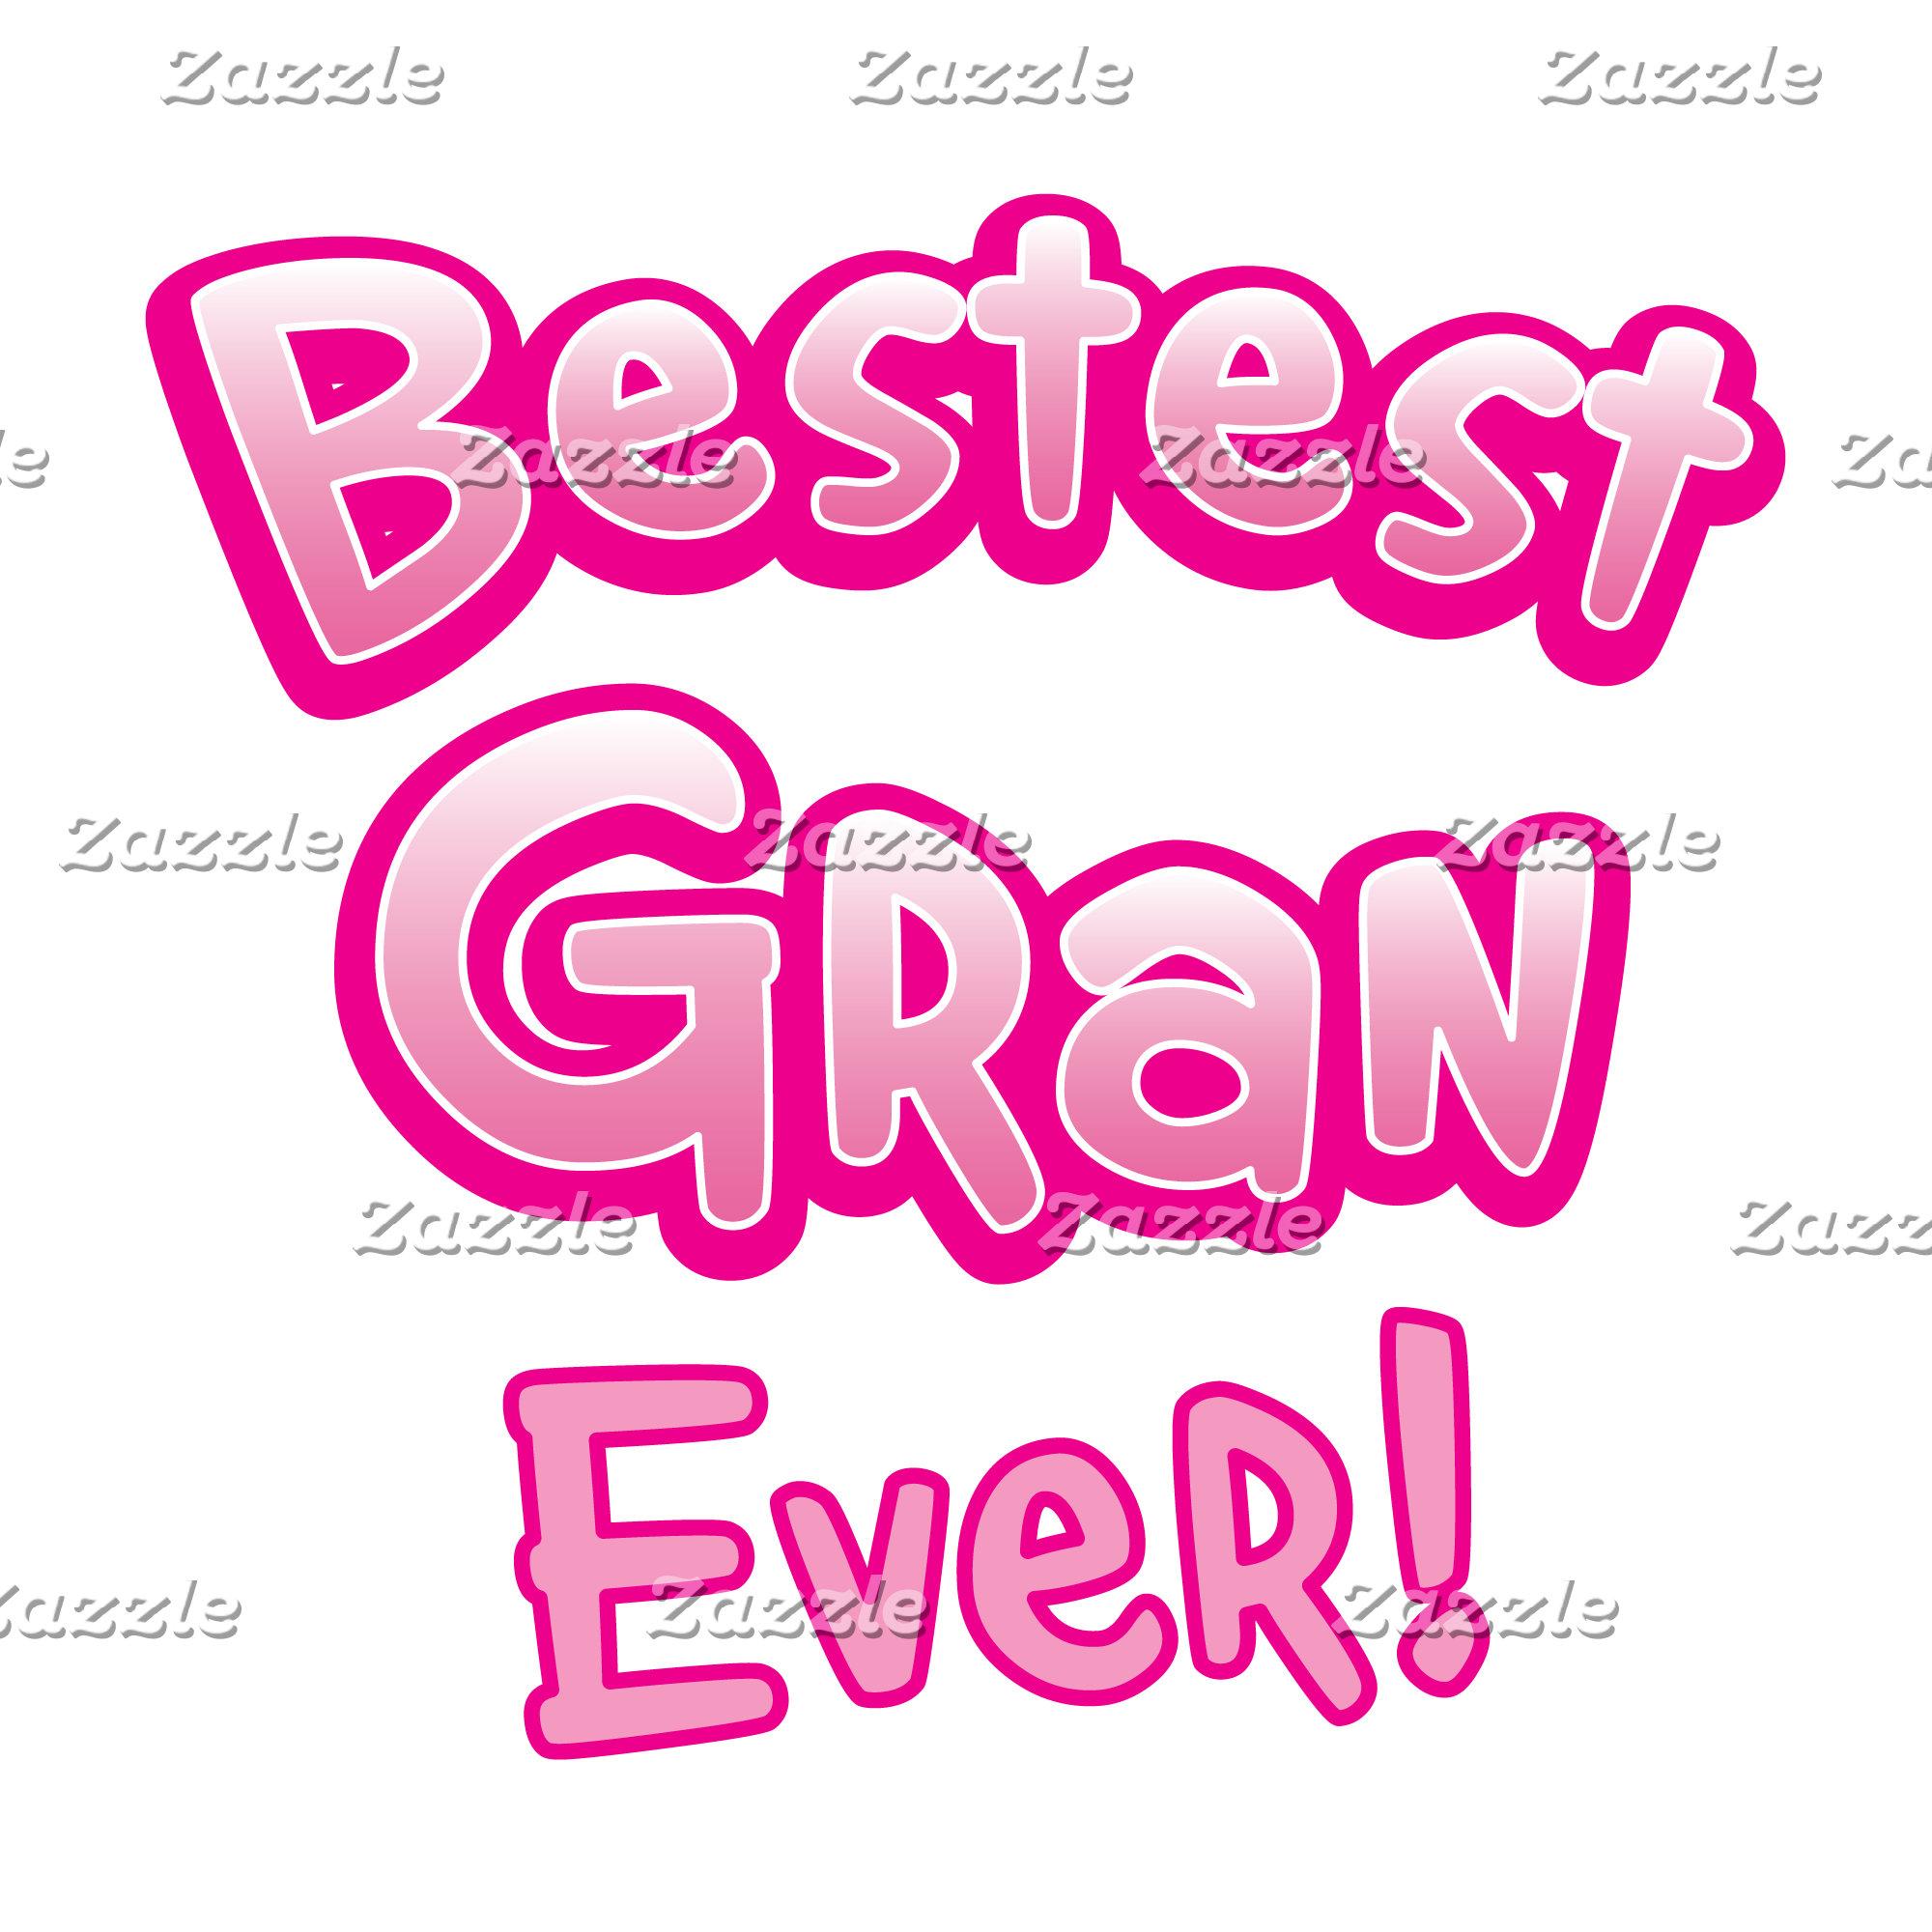 BESTEST gran EVER grandmother granny